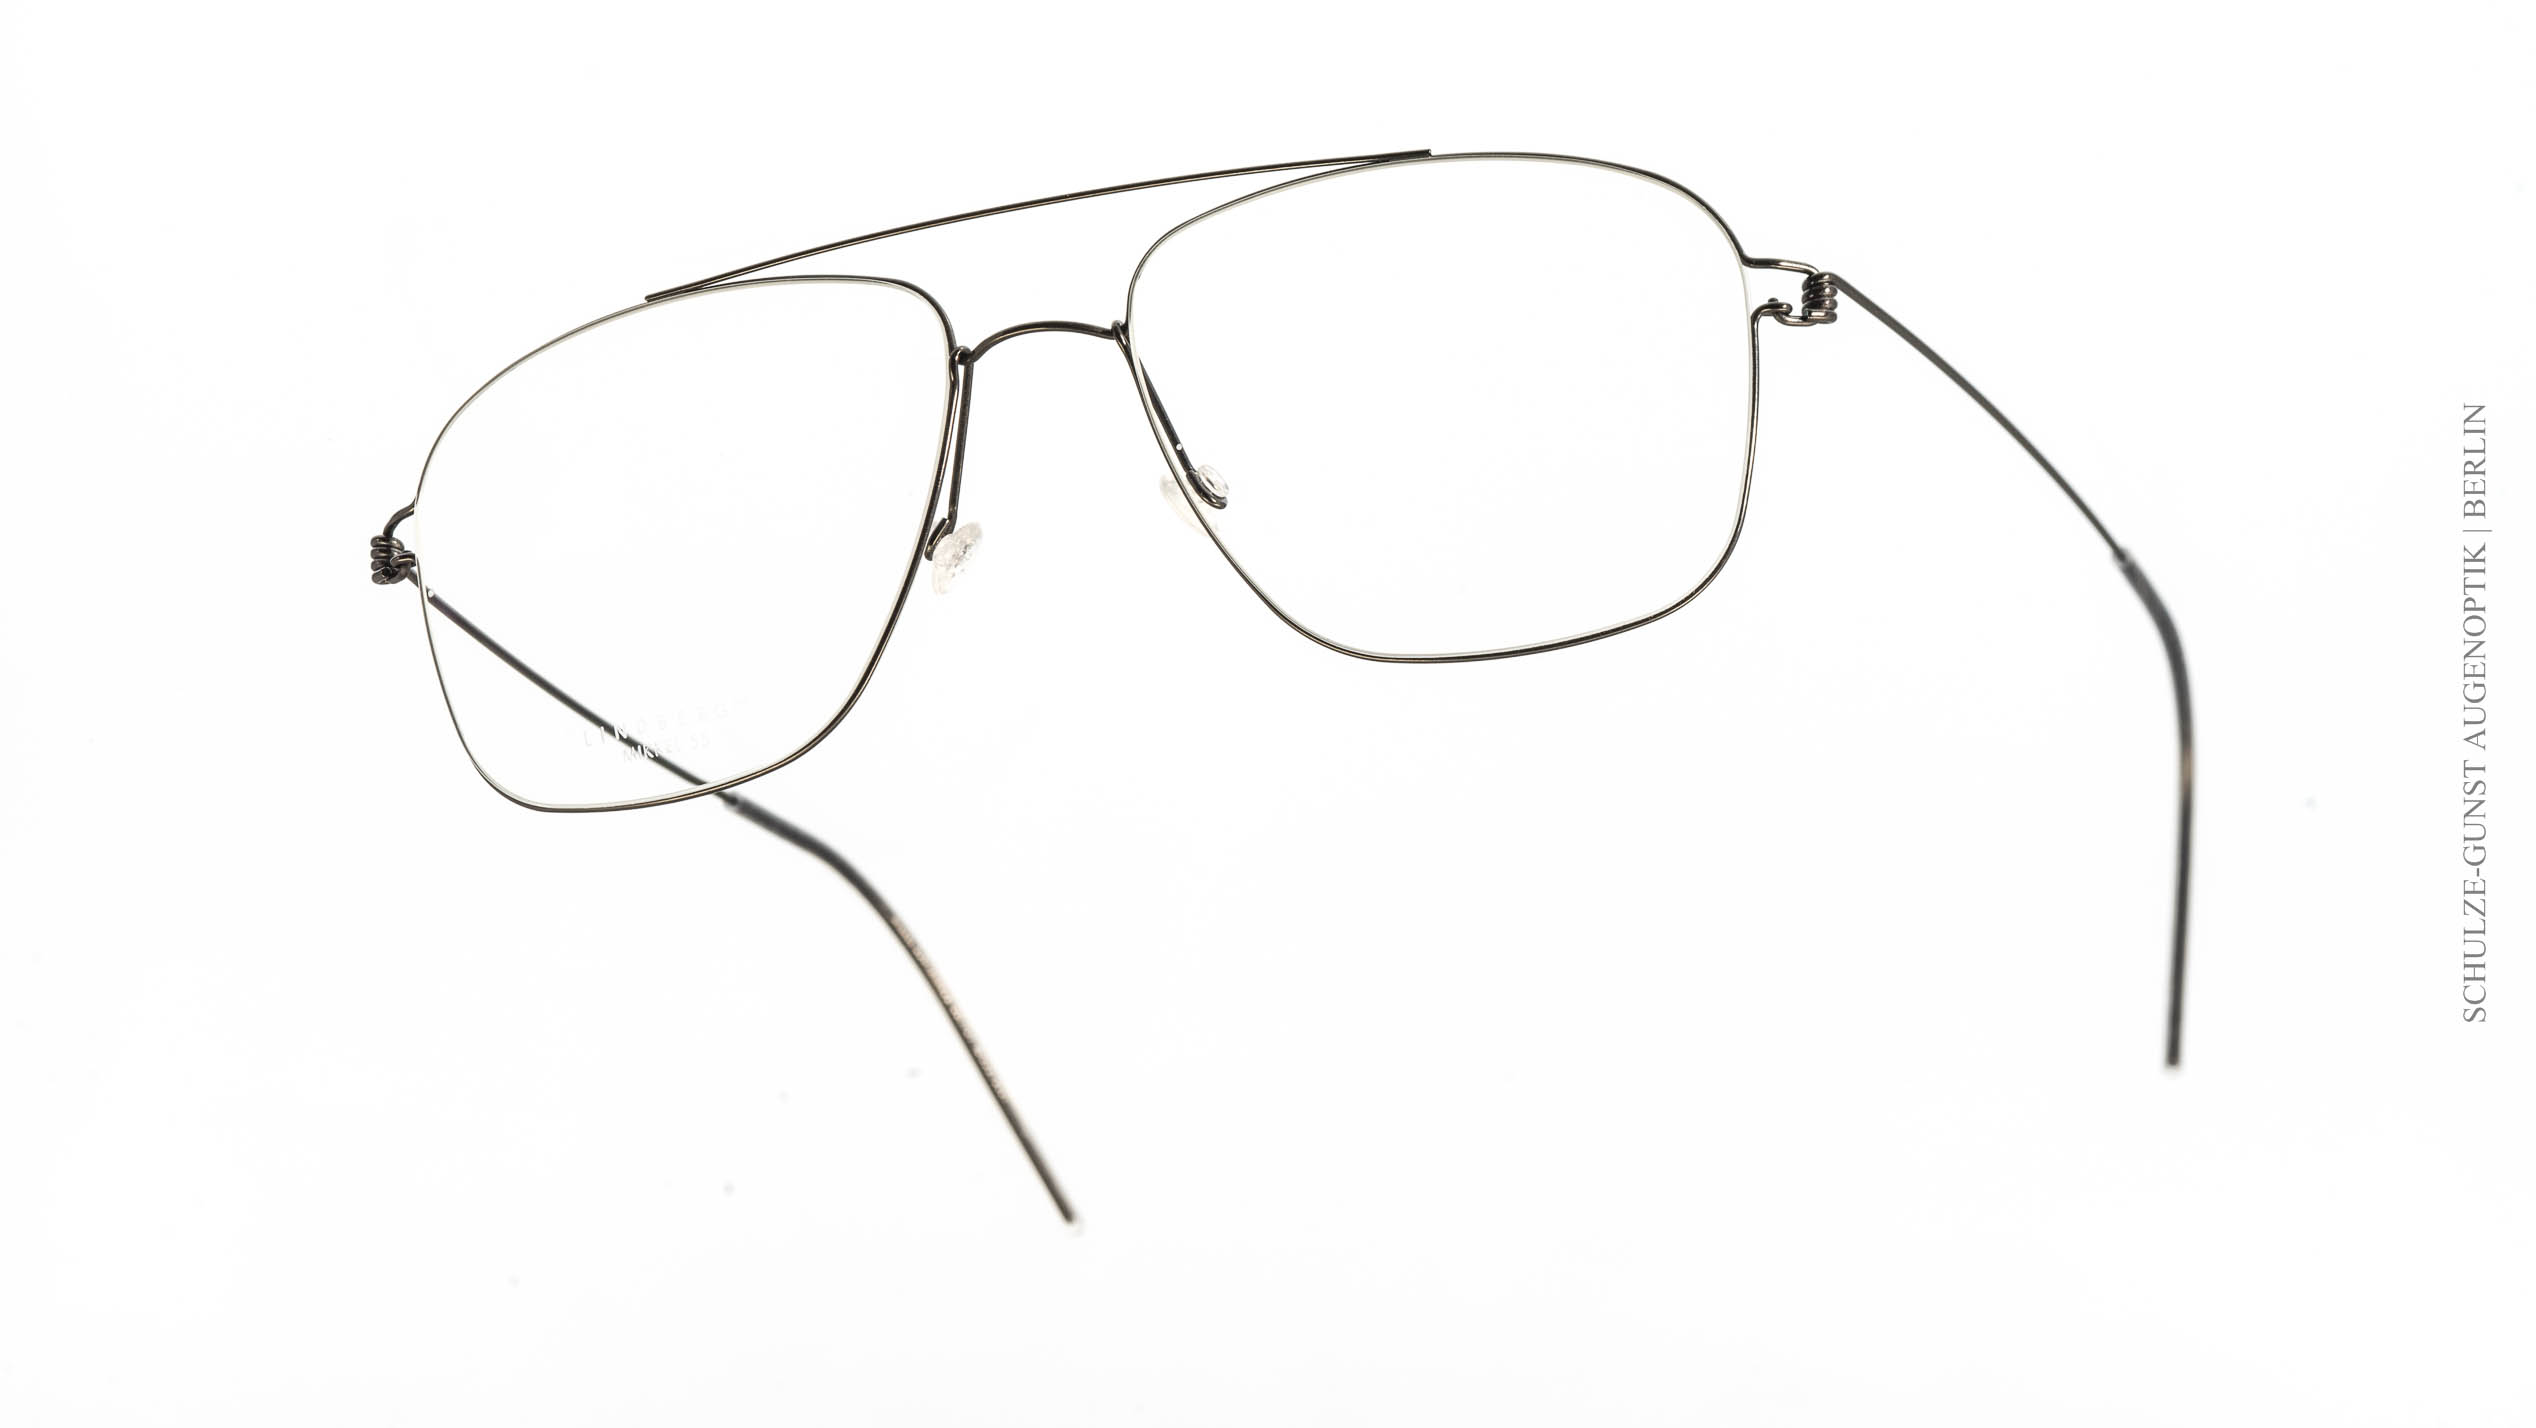 55bb8b74a06 lindberg-herrenbrille Archive - SCHULZE-GUNST Augenoptik seit 1894